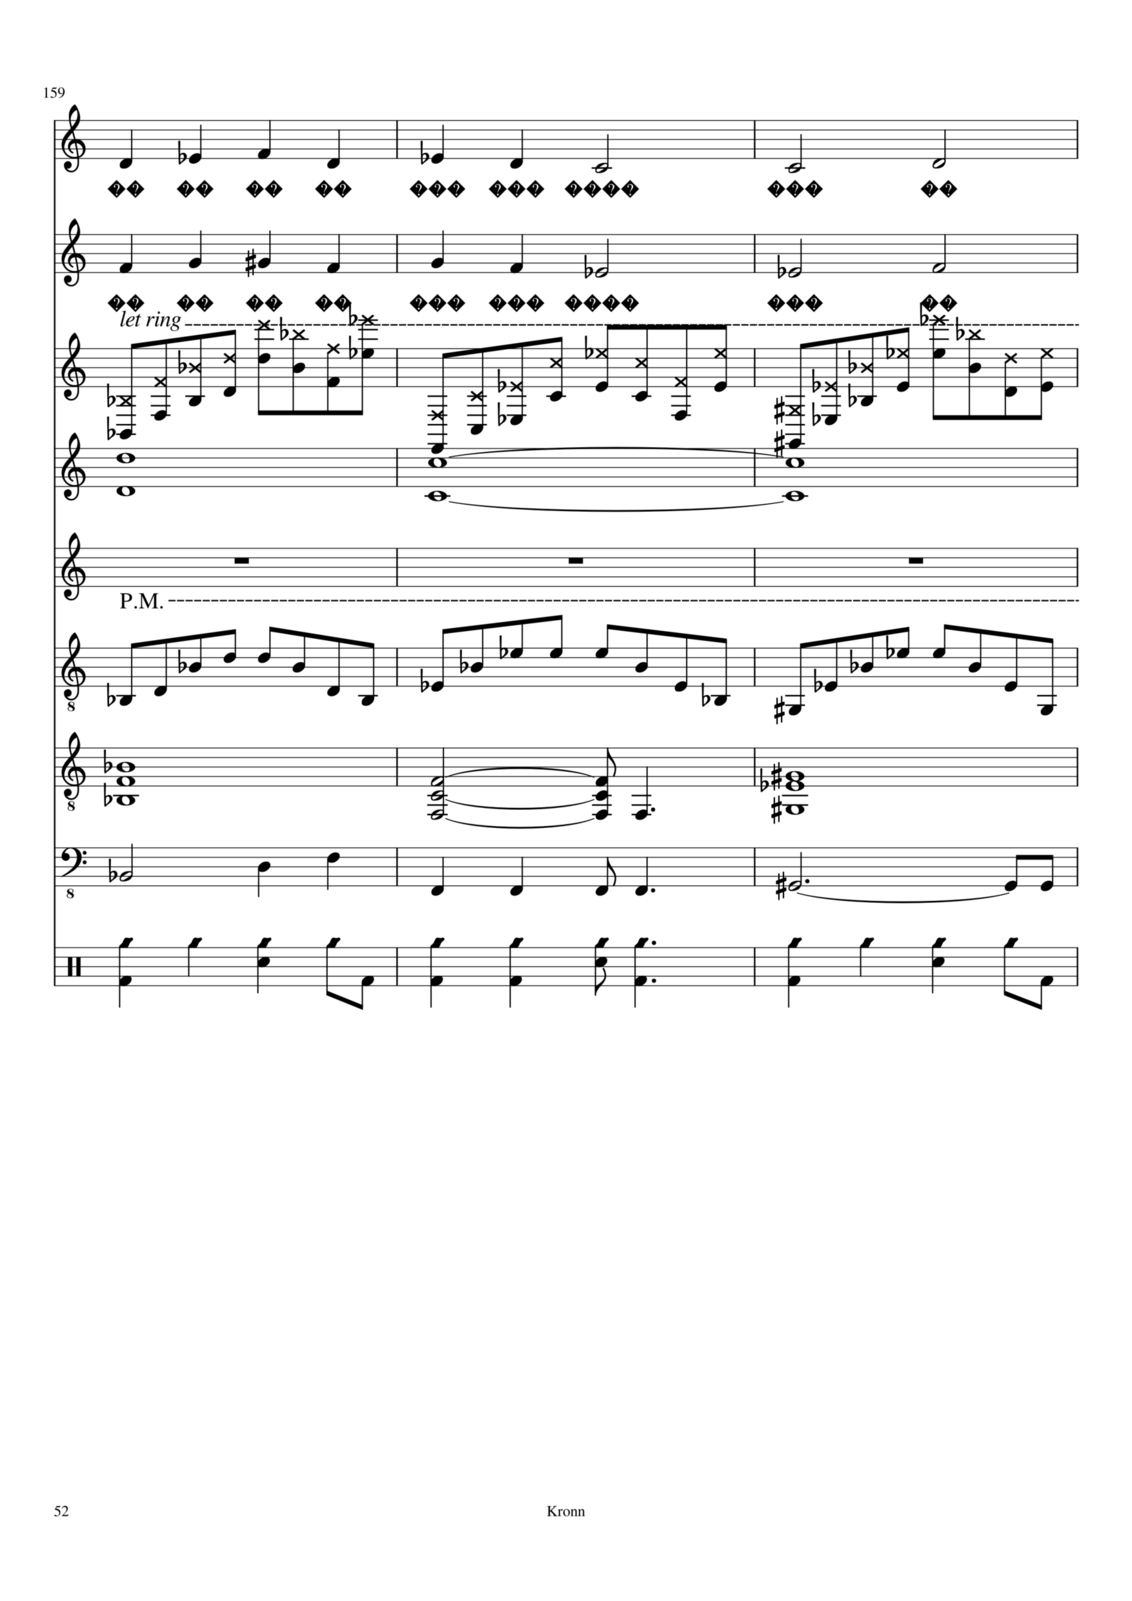 Okean Pustotyi slide, Image 52